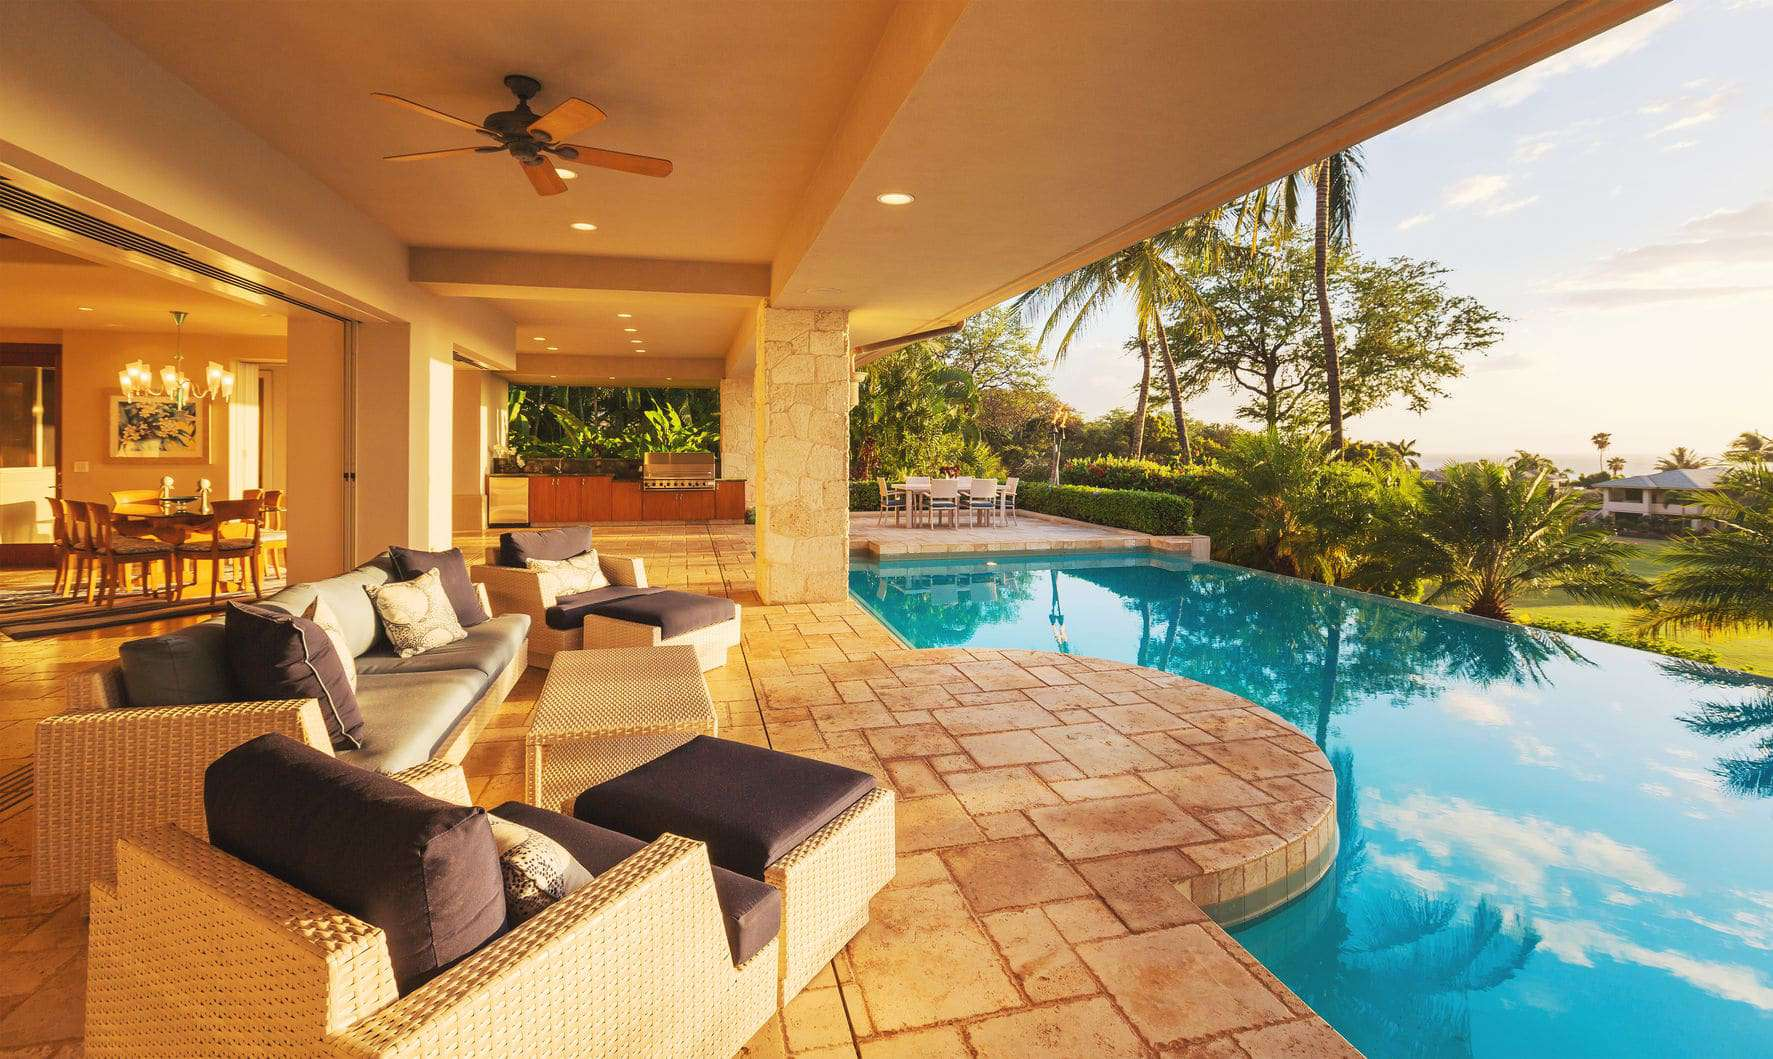 temecula homes  900000 to 1 million dollars